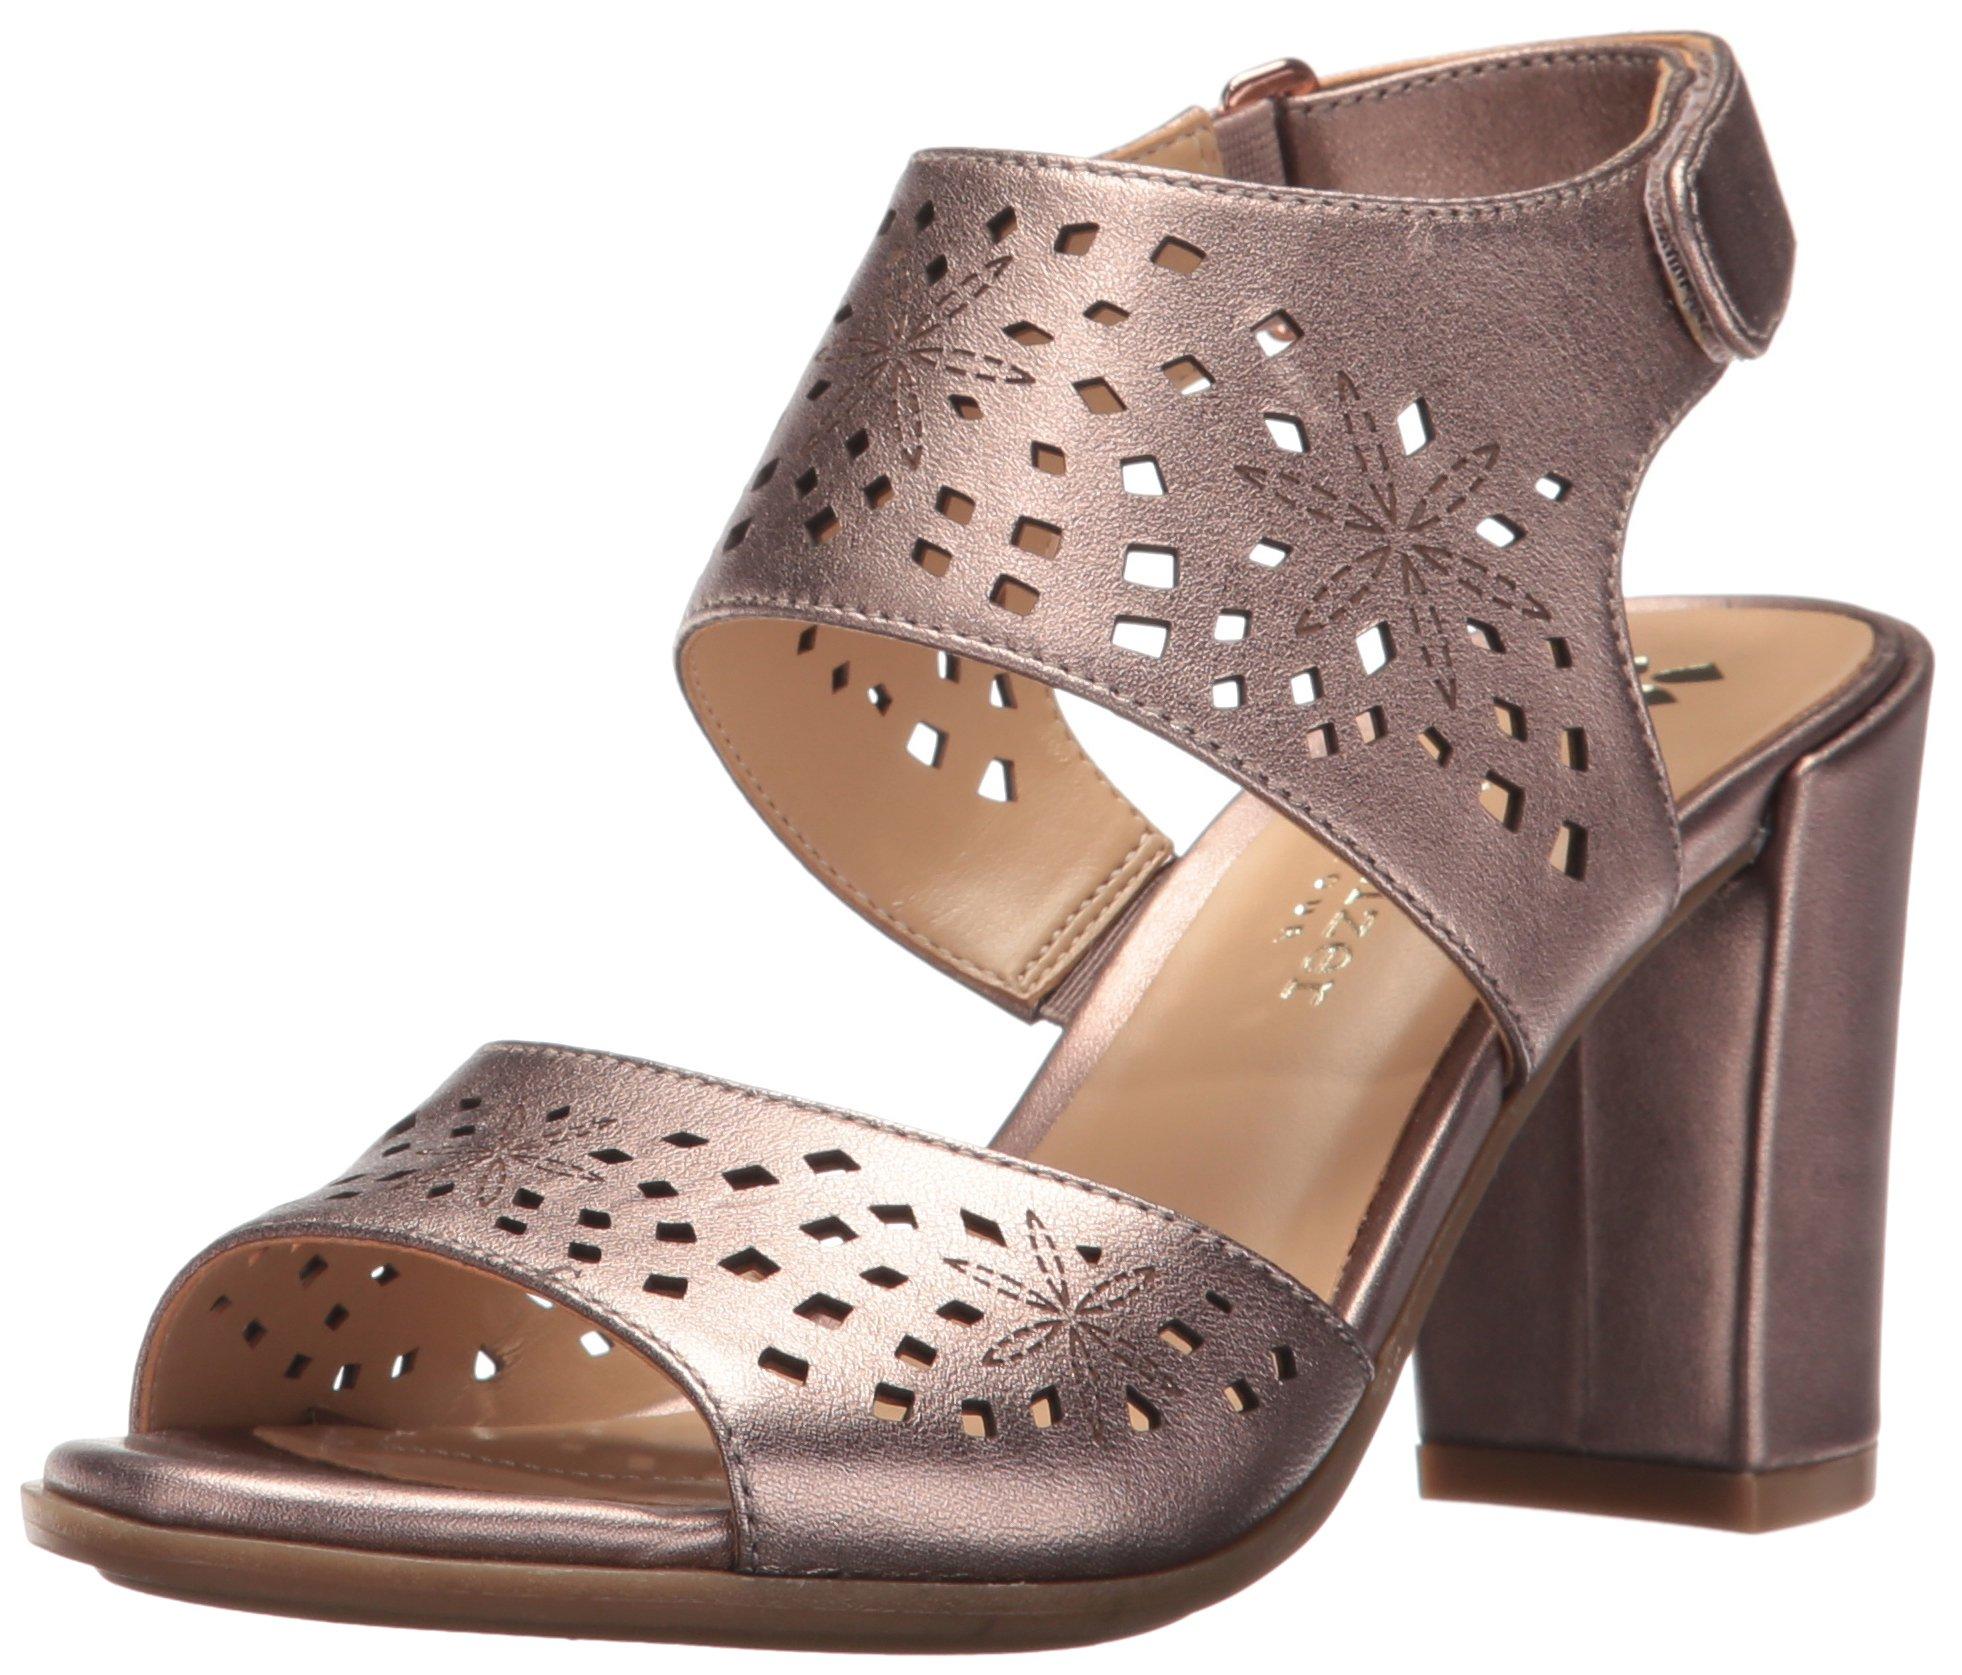 Naturalizer Women's Zinna Dress Sandal, Bronze, 9 M US